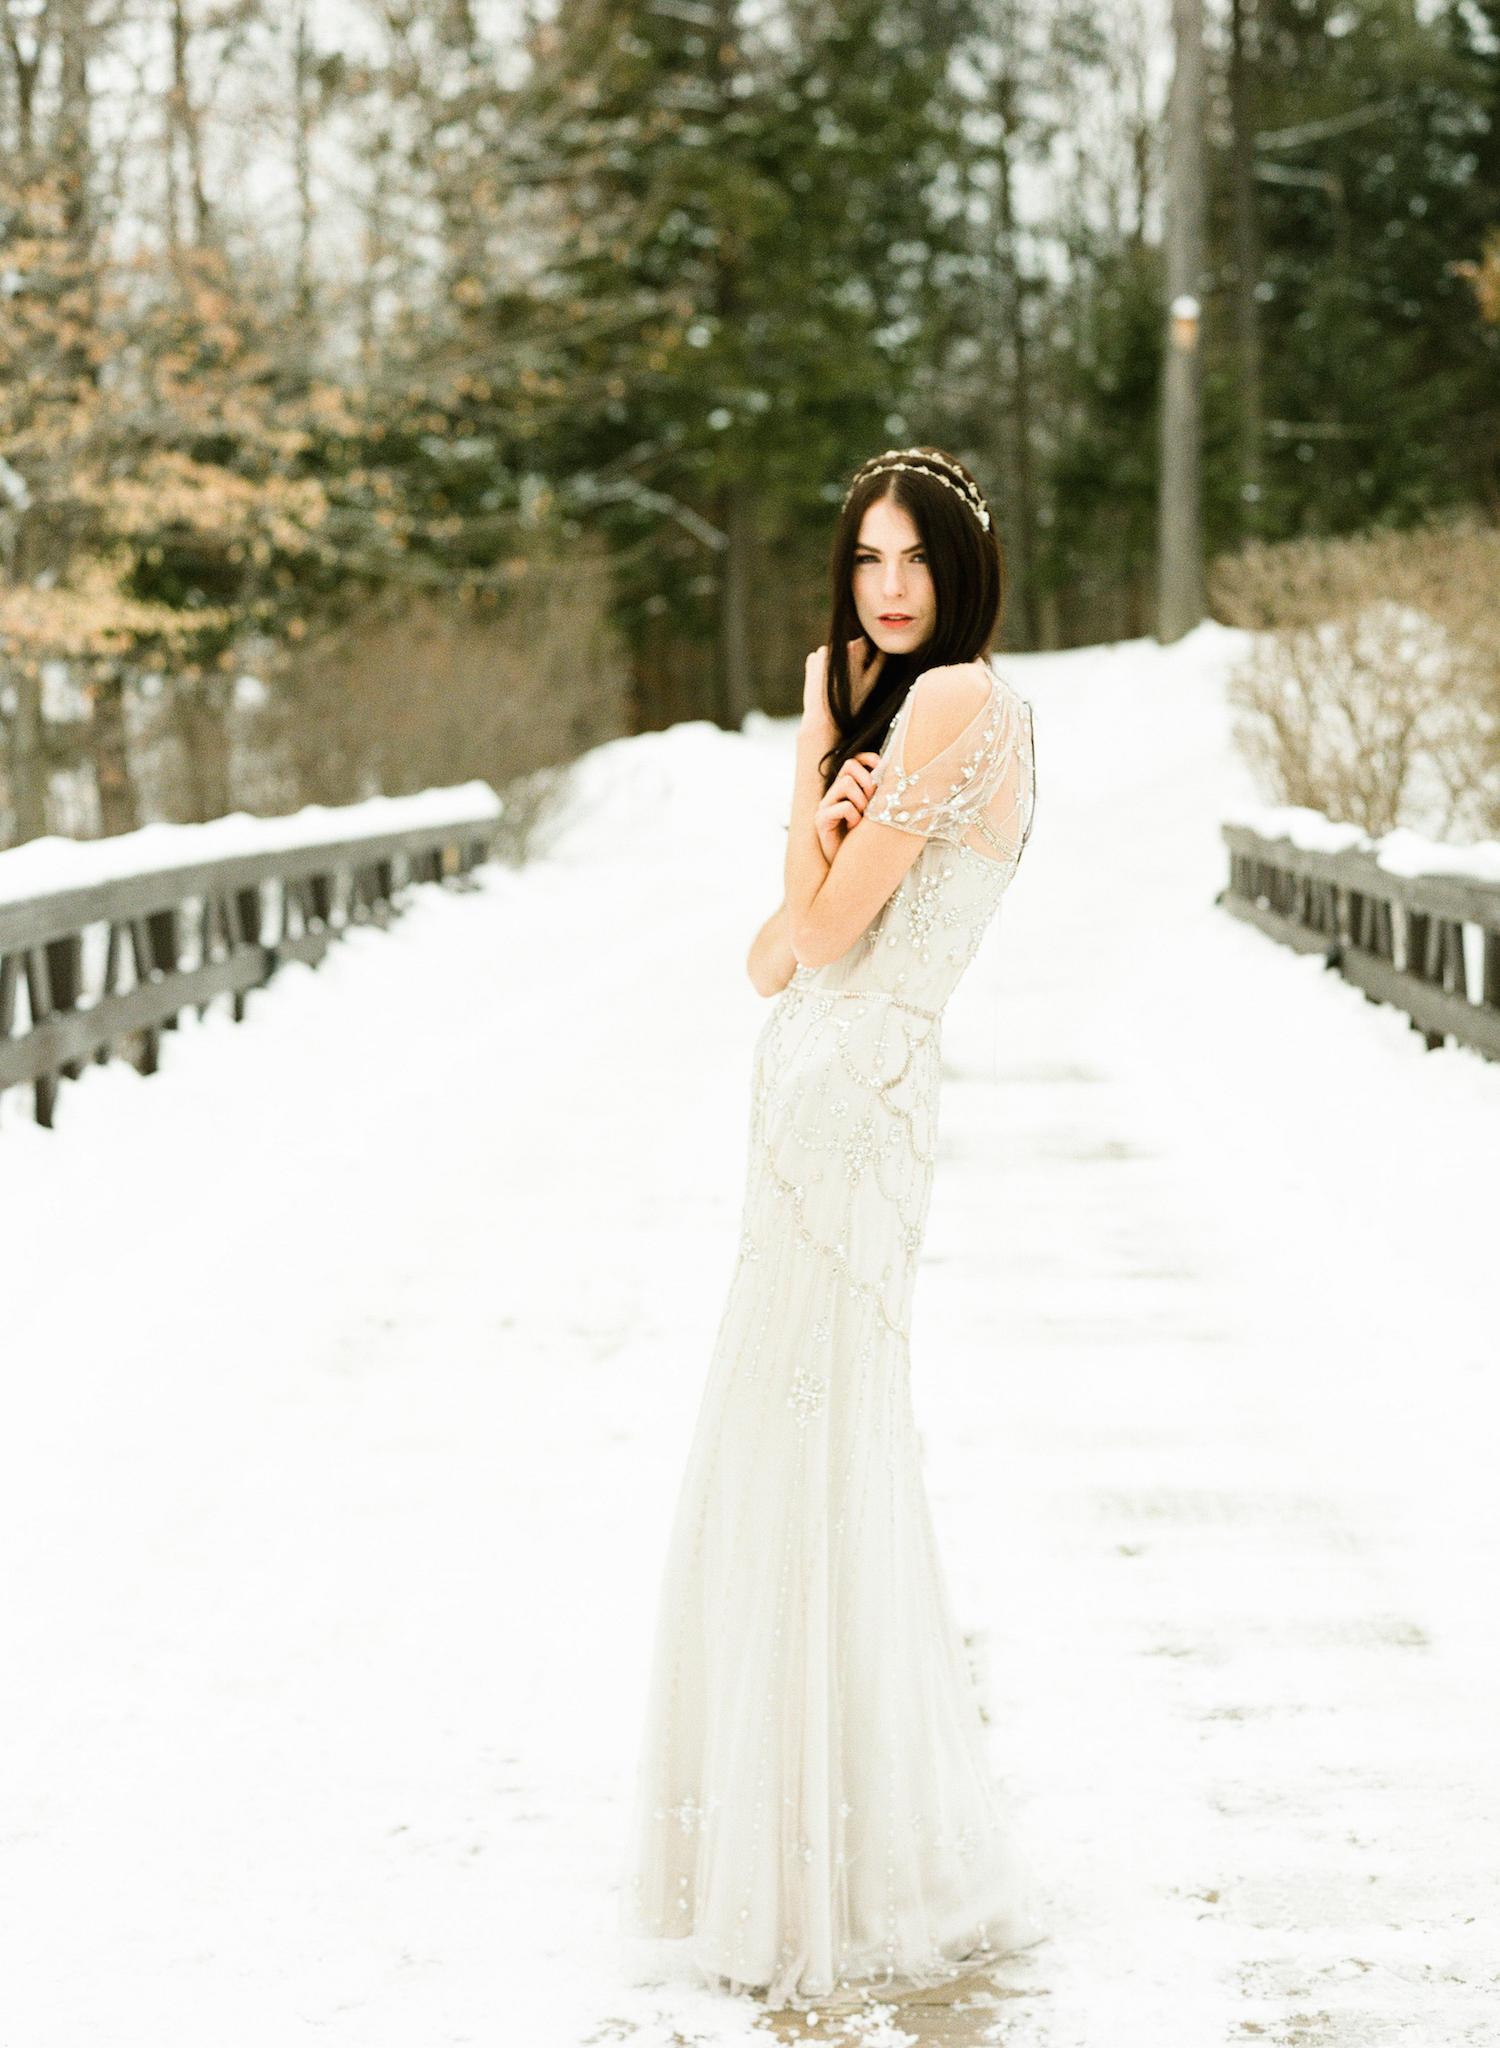 Winter Editorial-JennyPackham-LindsayMaddenPhotography-29 copy.jpg